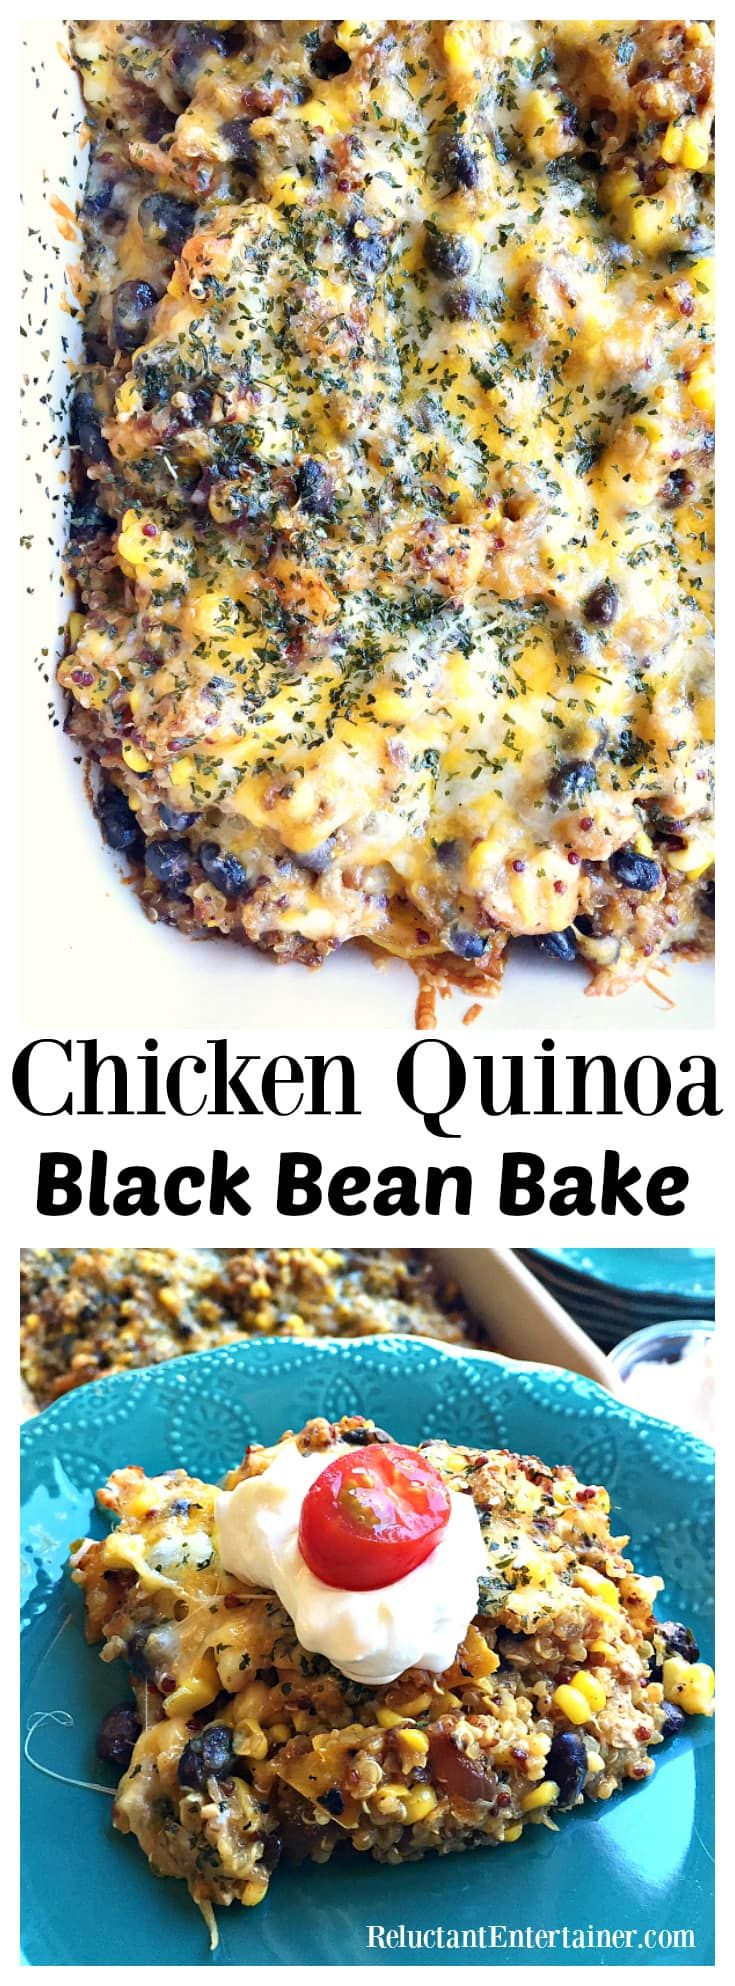 Chicken Quinoa Black Bean Bake at ReluctantEntertainer.com